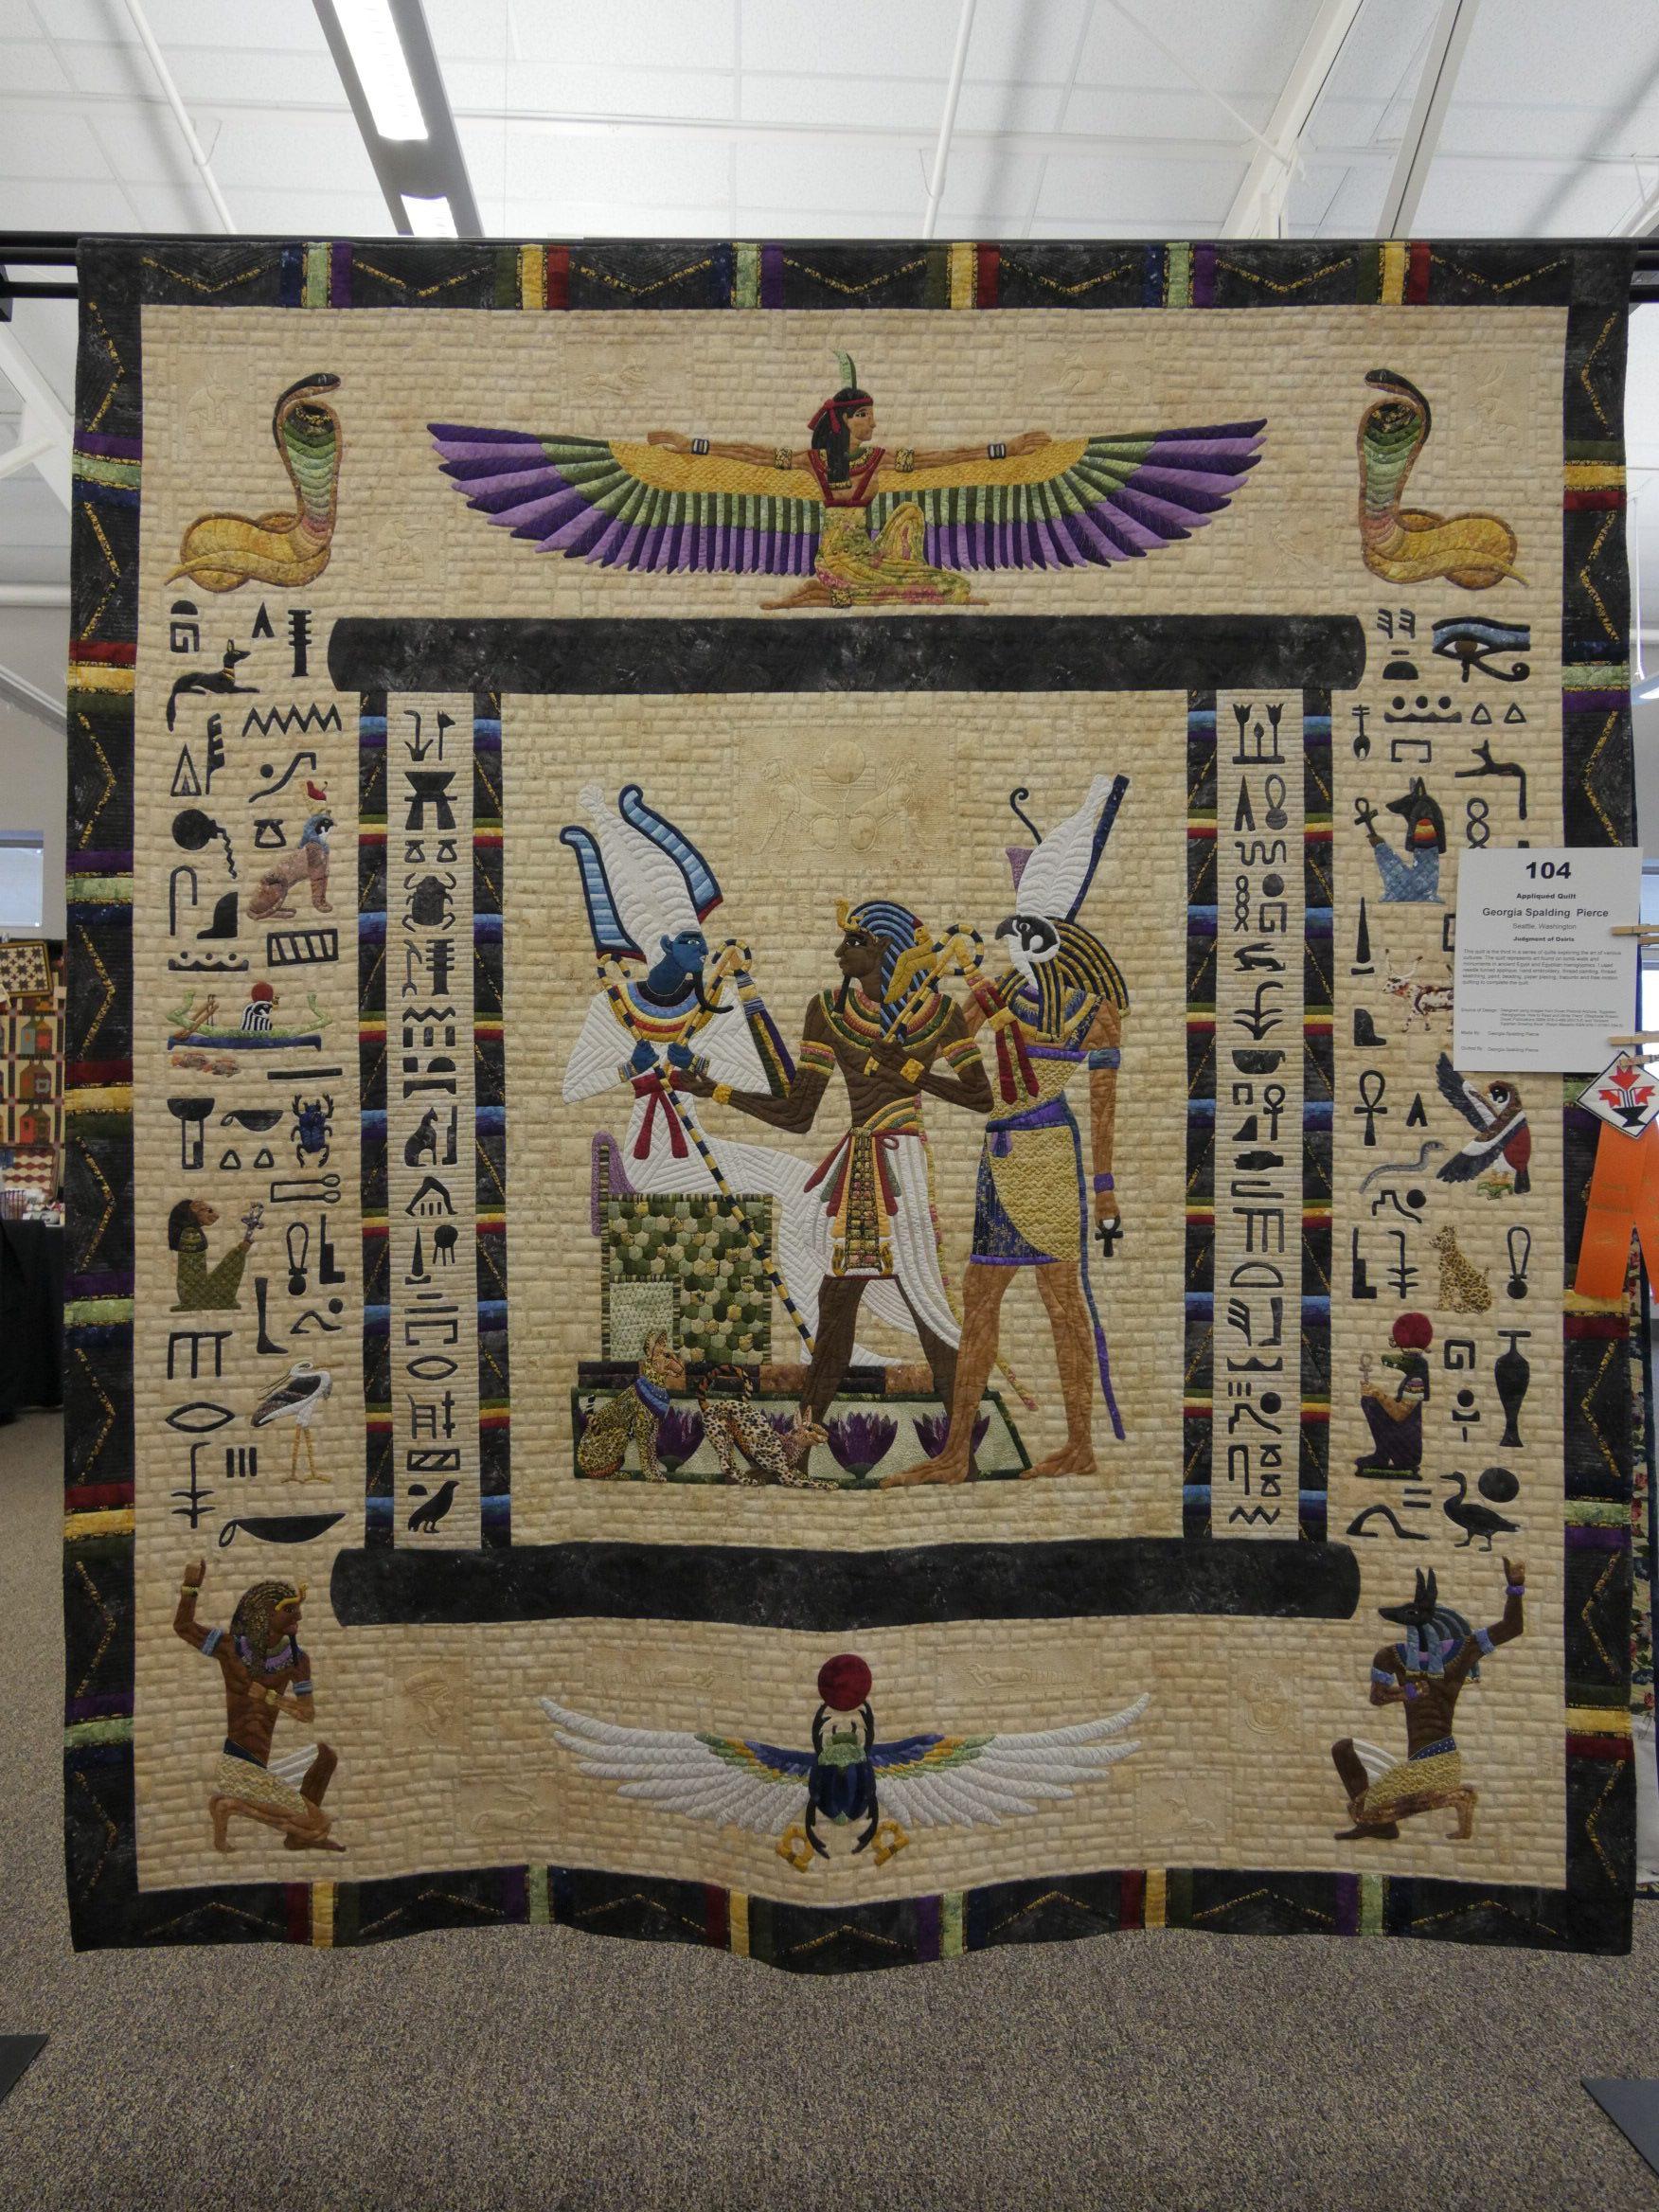 Judgment of Osiris